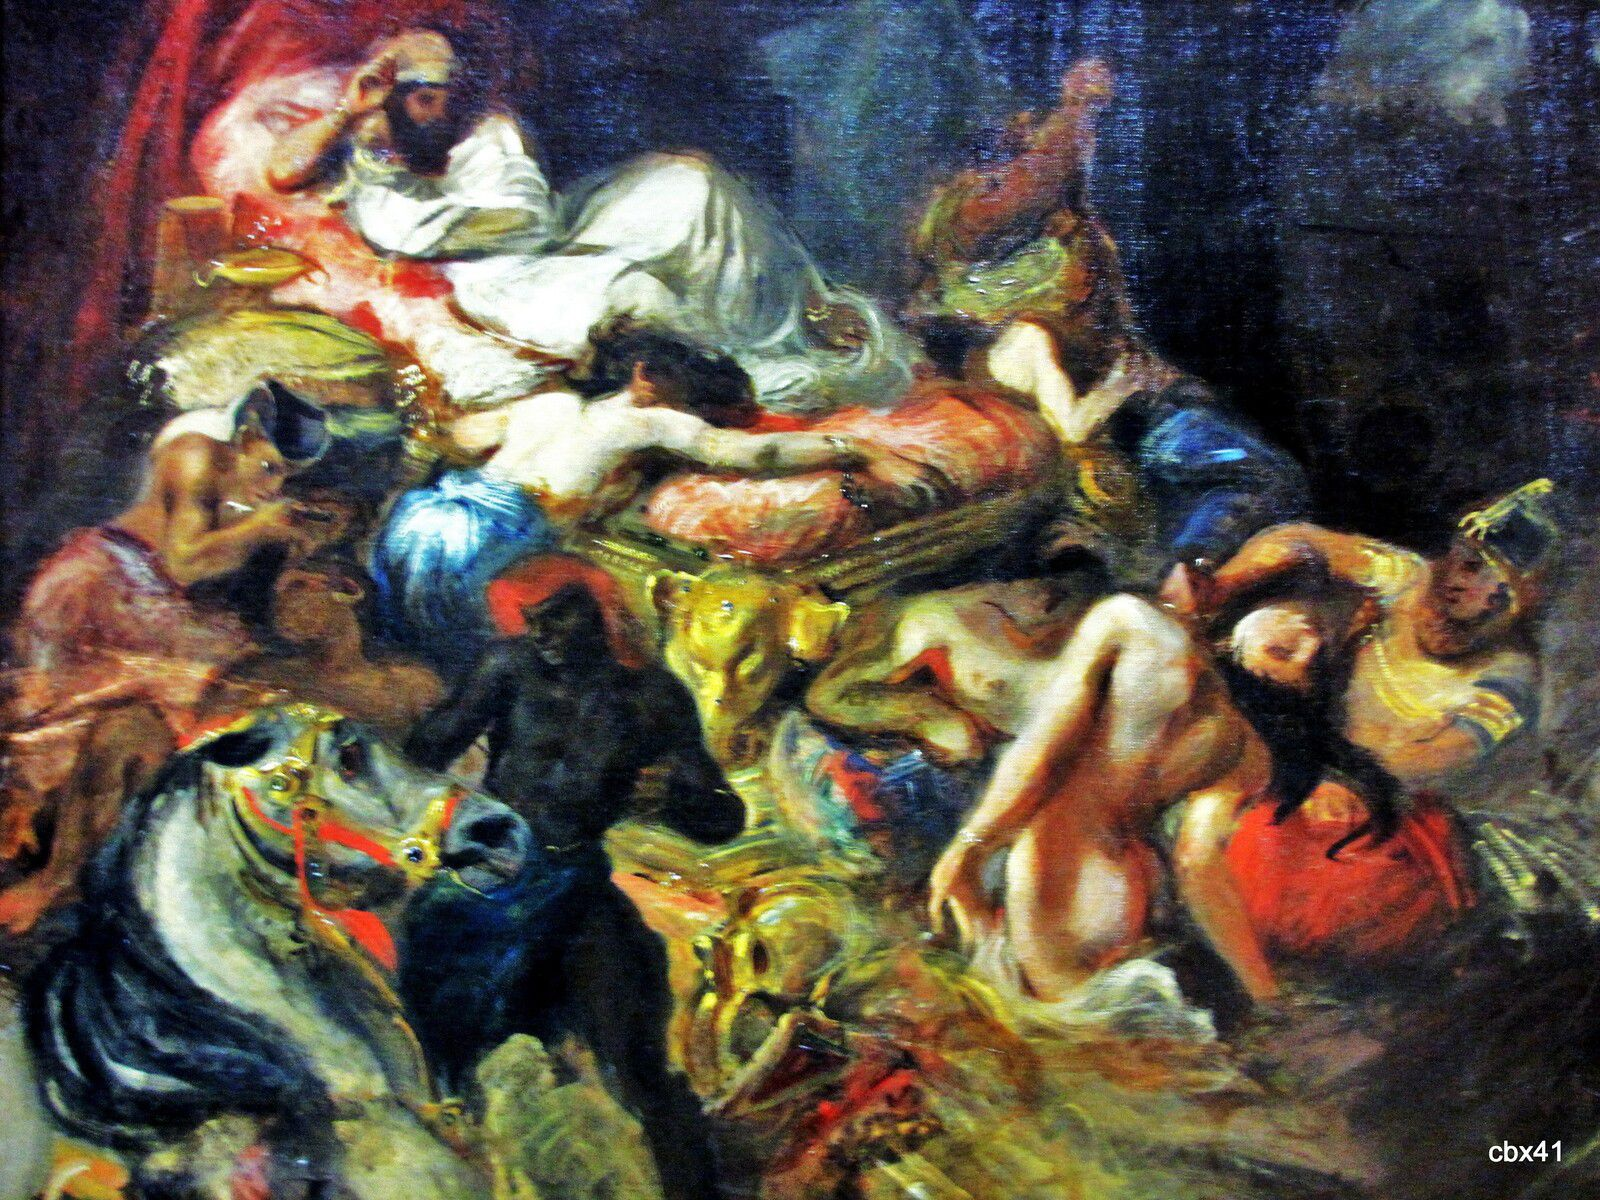 Eugène Delacroix, Mort de Sardanapale